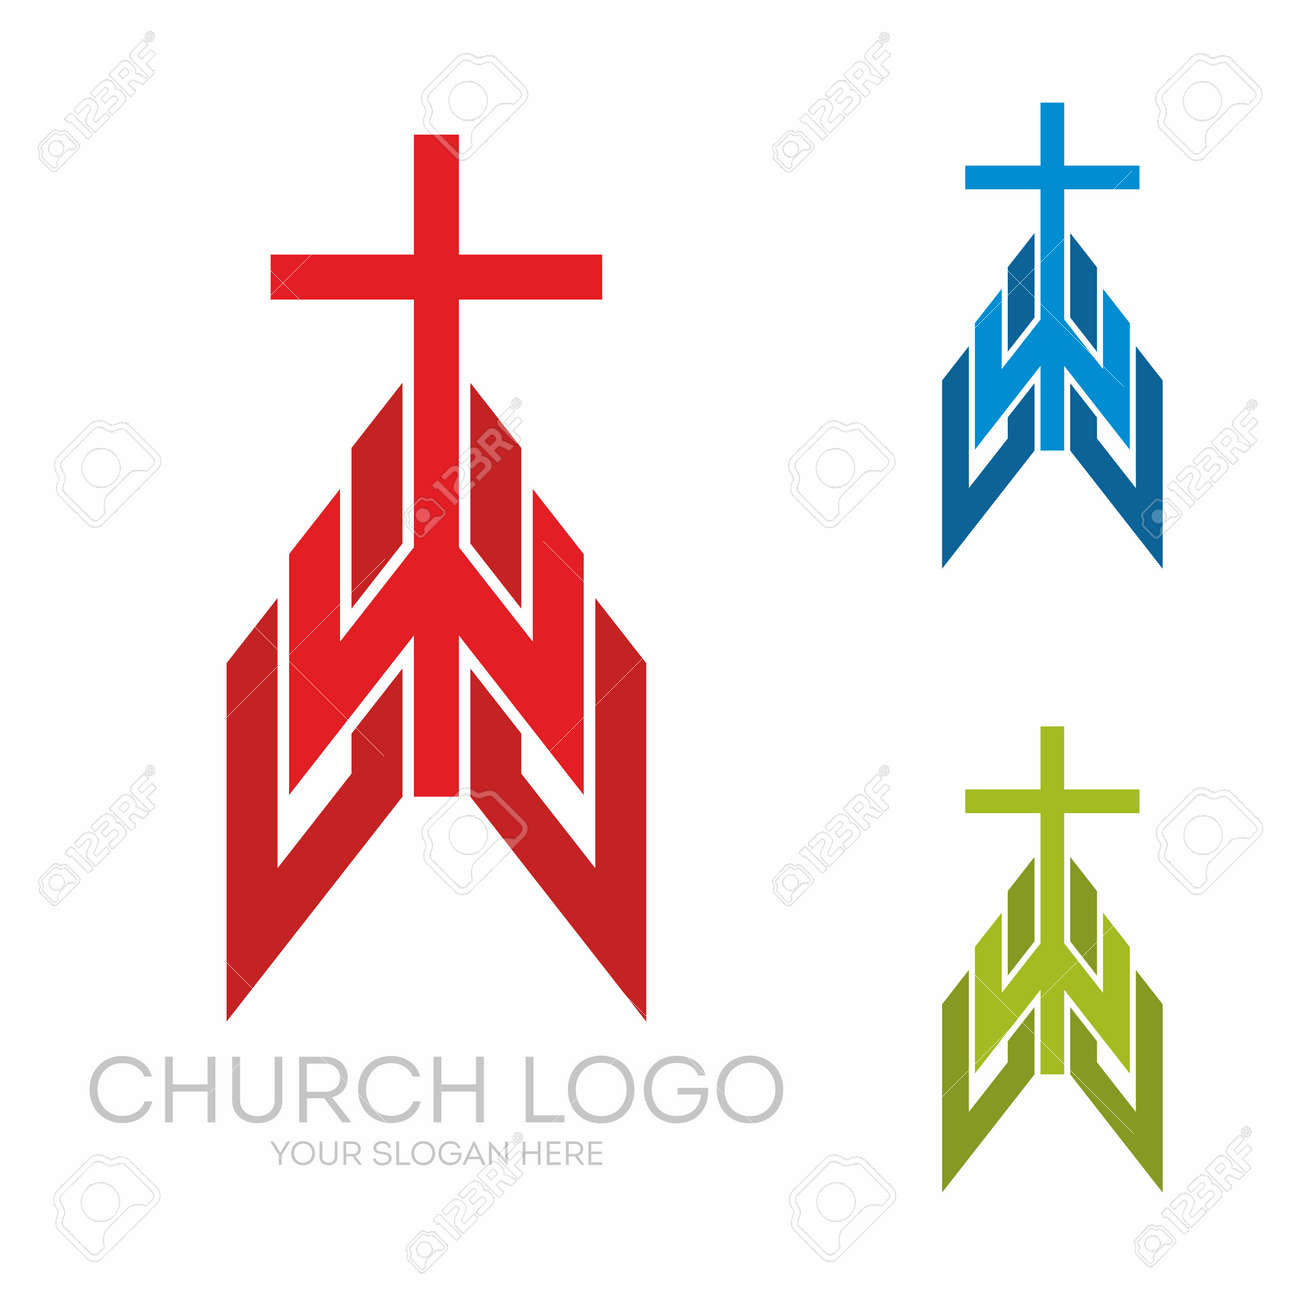 Christian Symbols Stylish Cross Of Jesus Christ Among Graphic